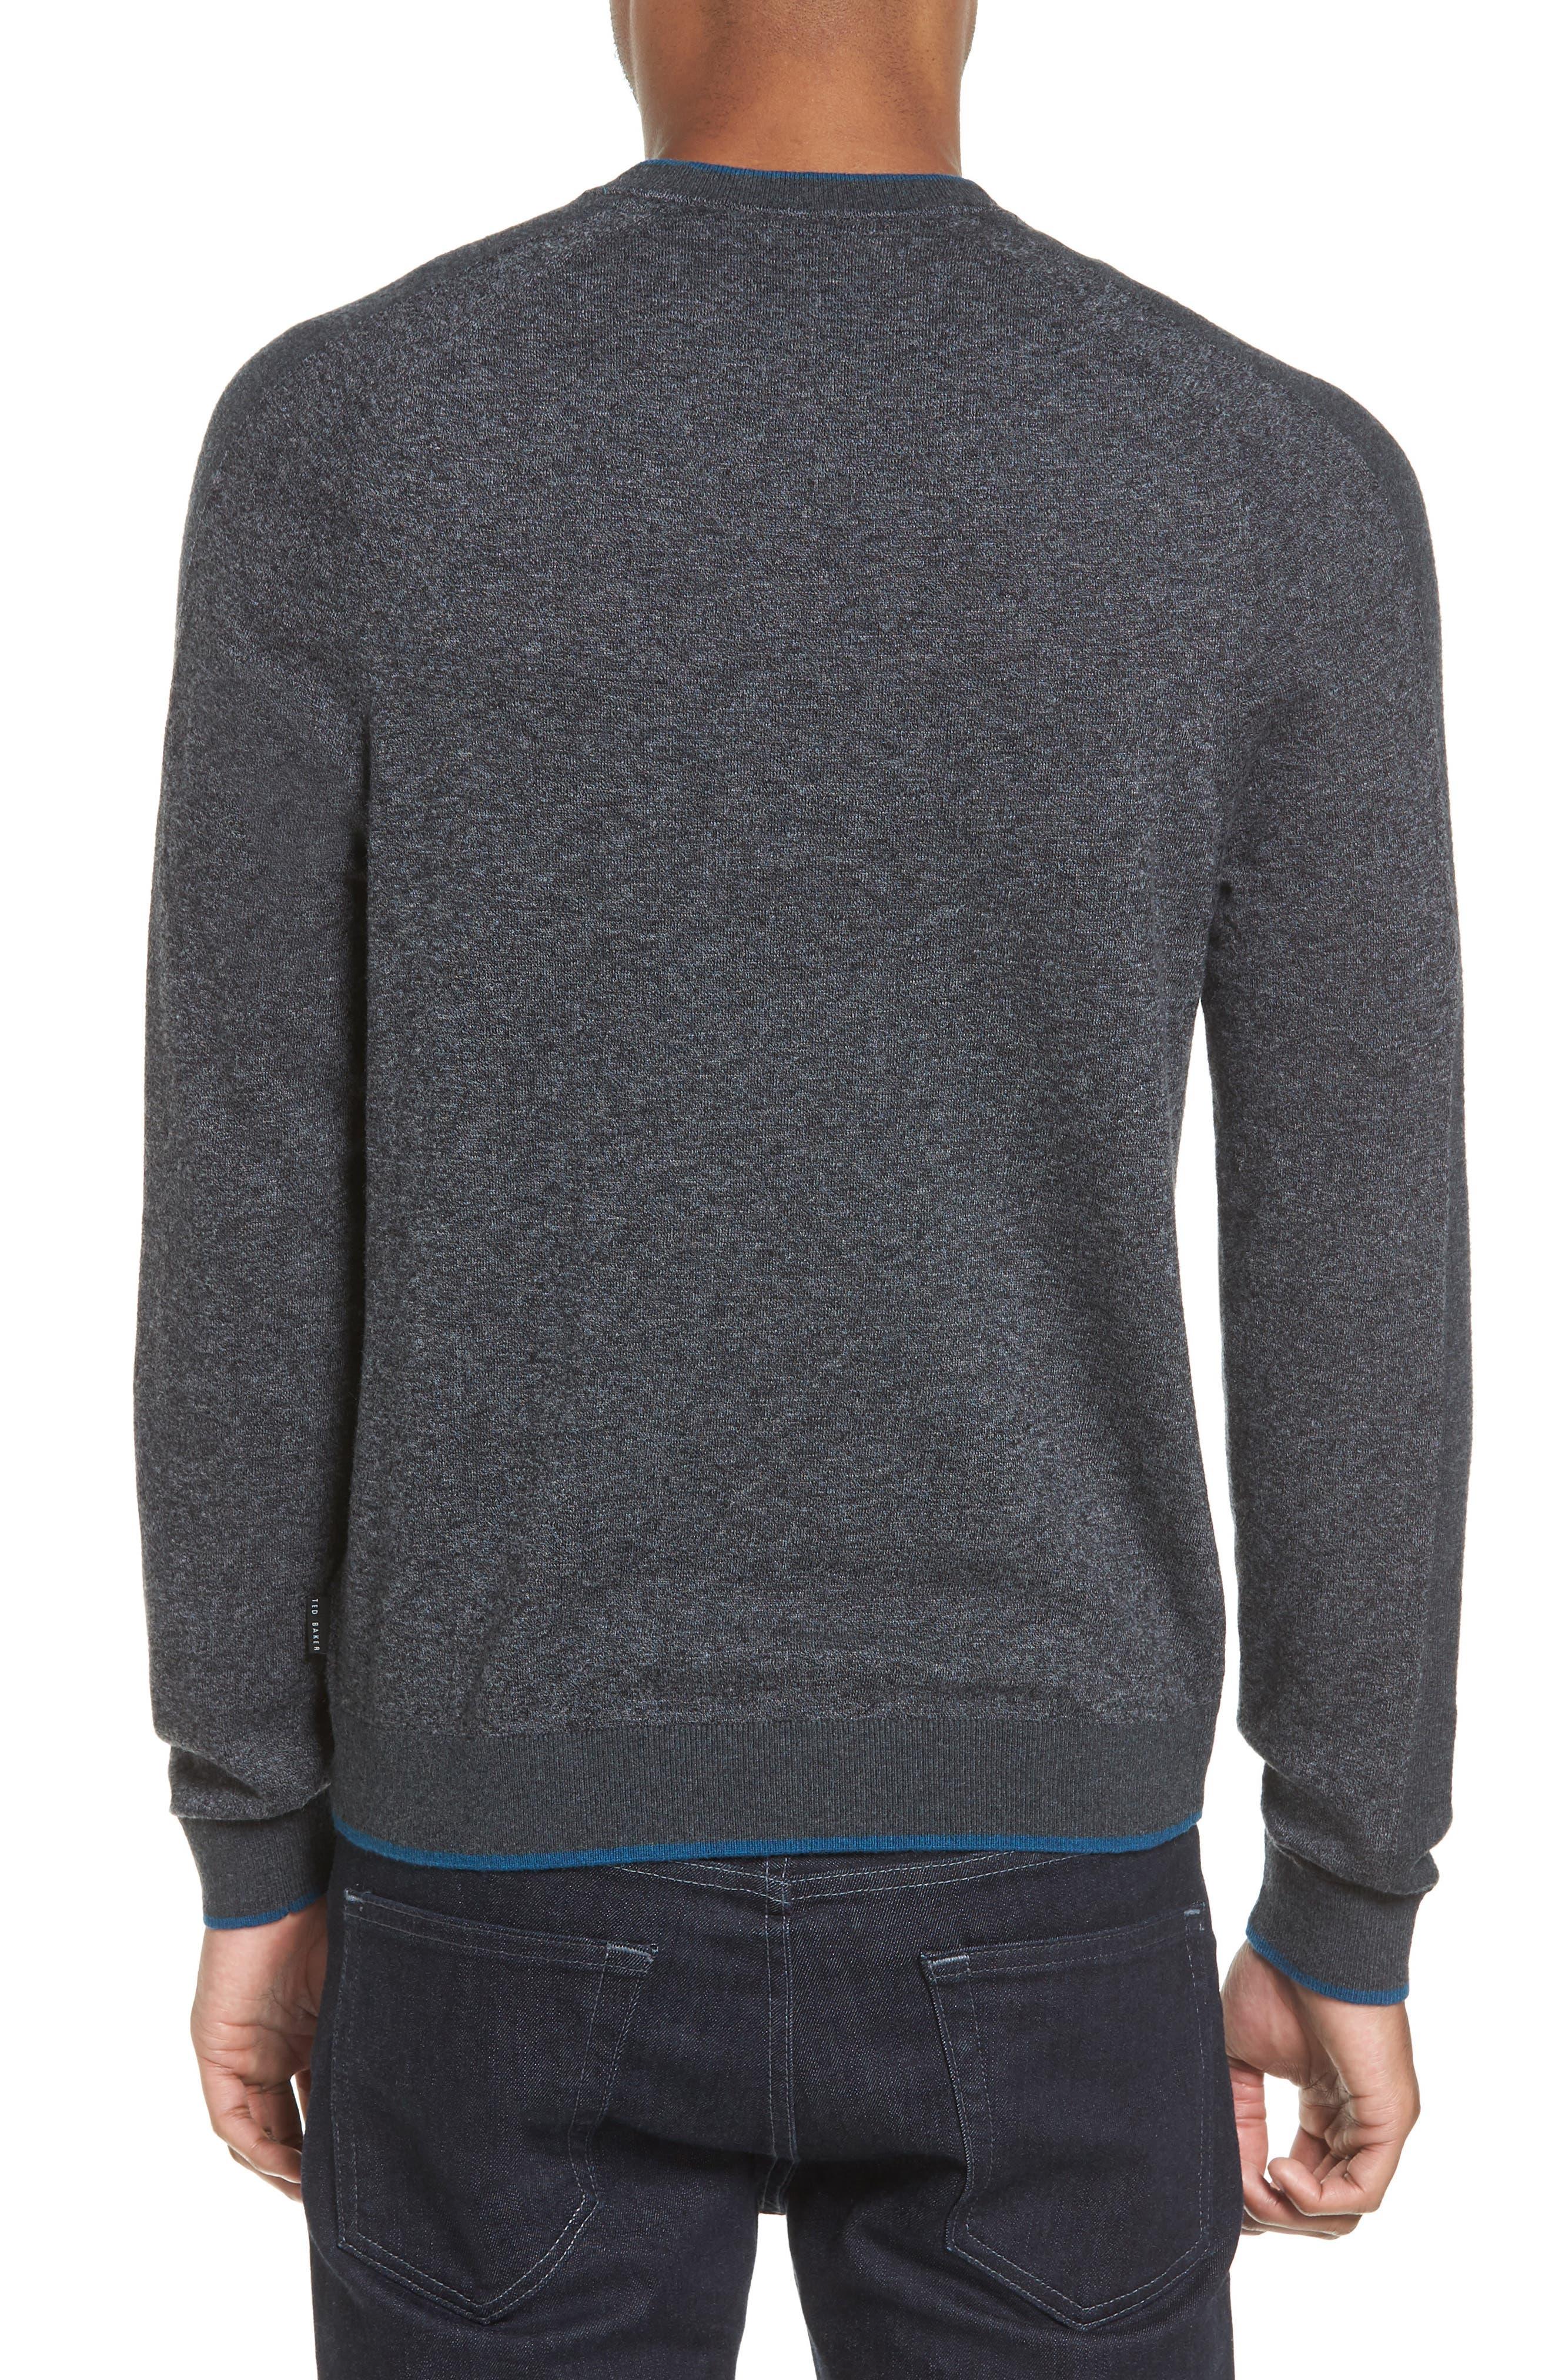 Norpol Crewneck Sweater,                             Alternate thumbnail 2, color,                             010